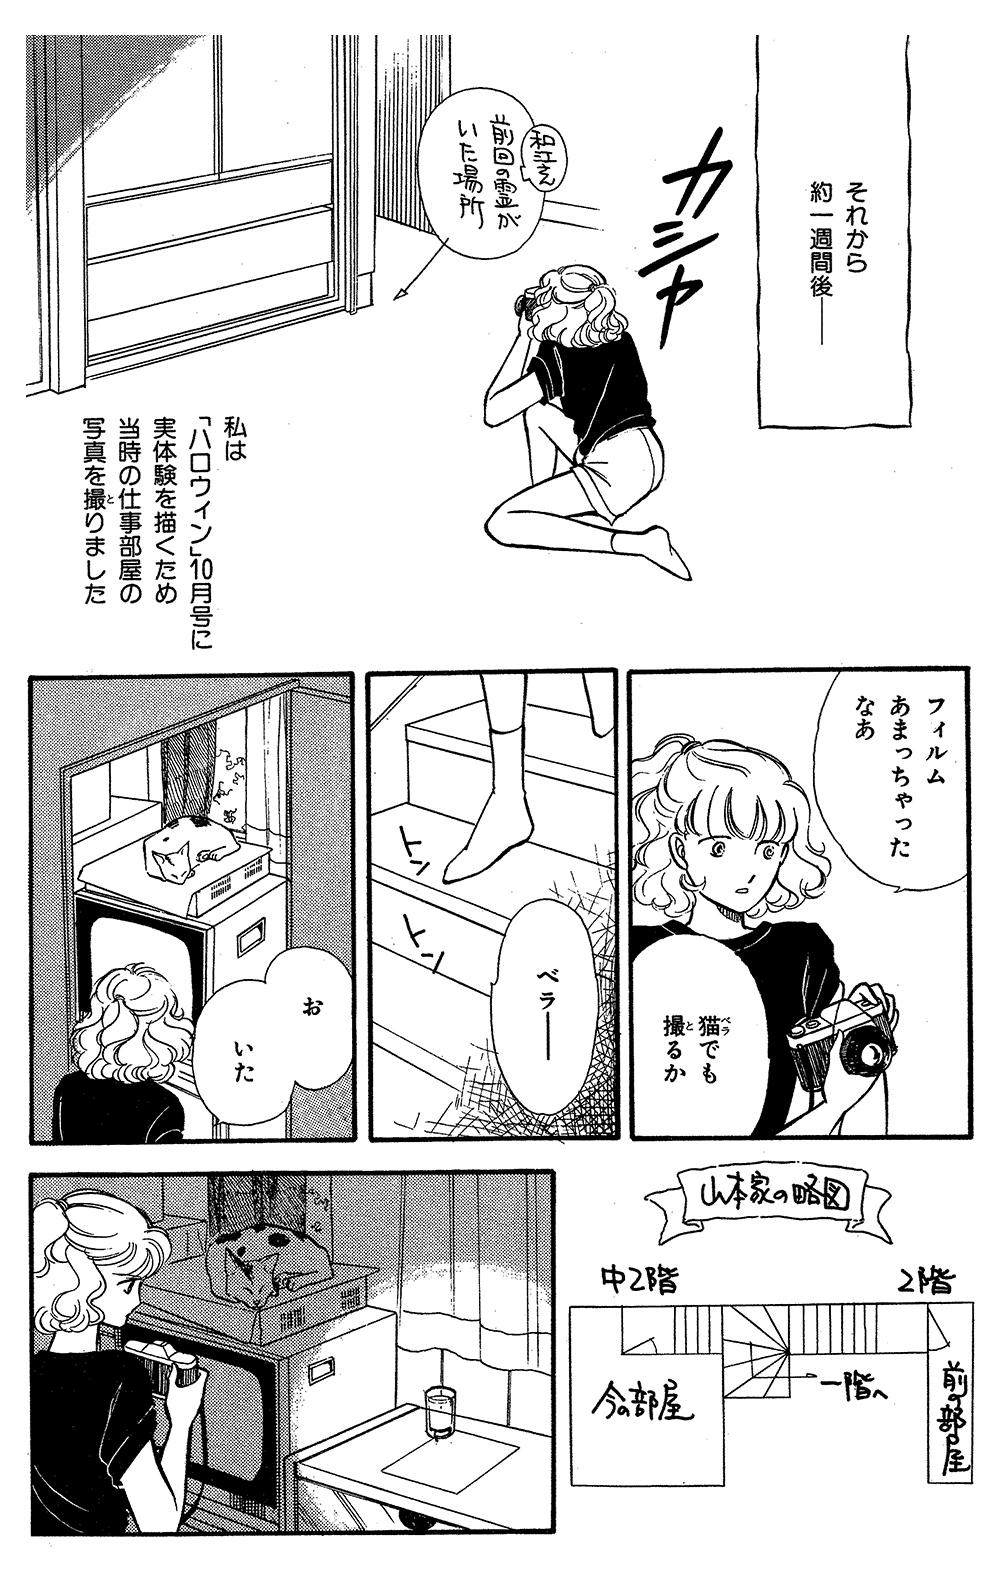 mayuri2-1-9.jpg